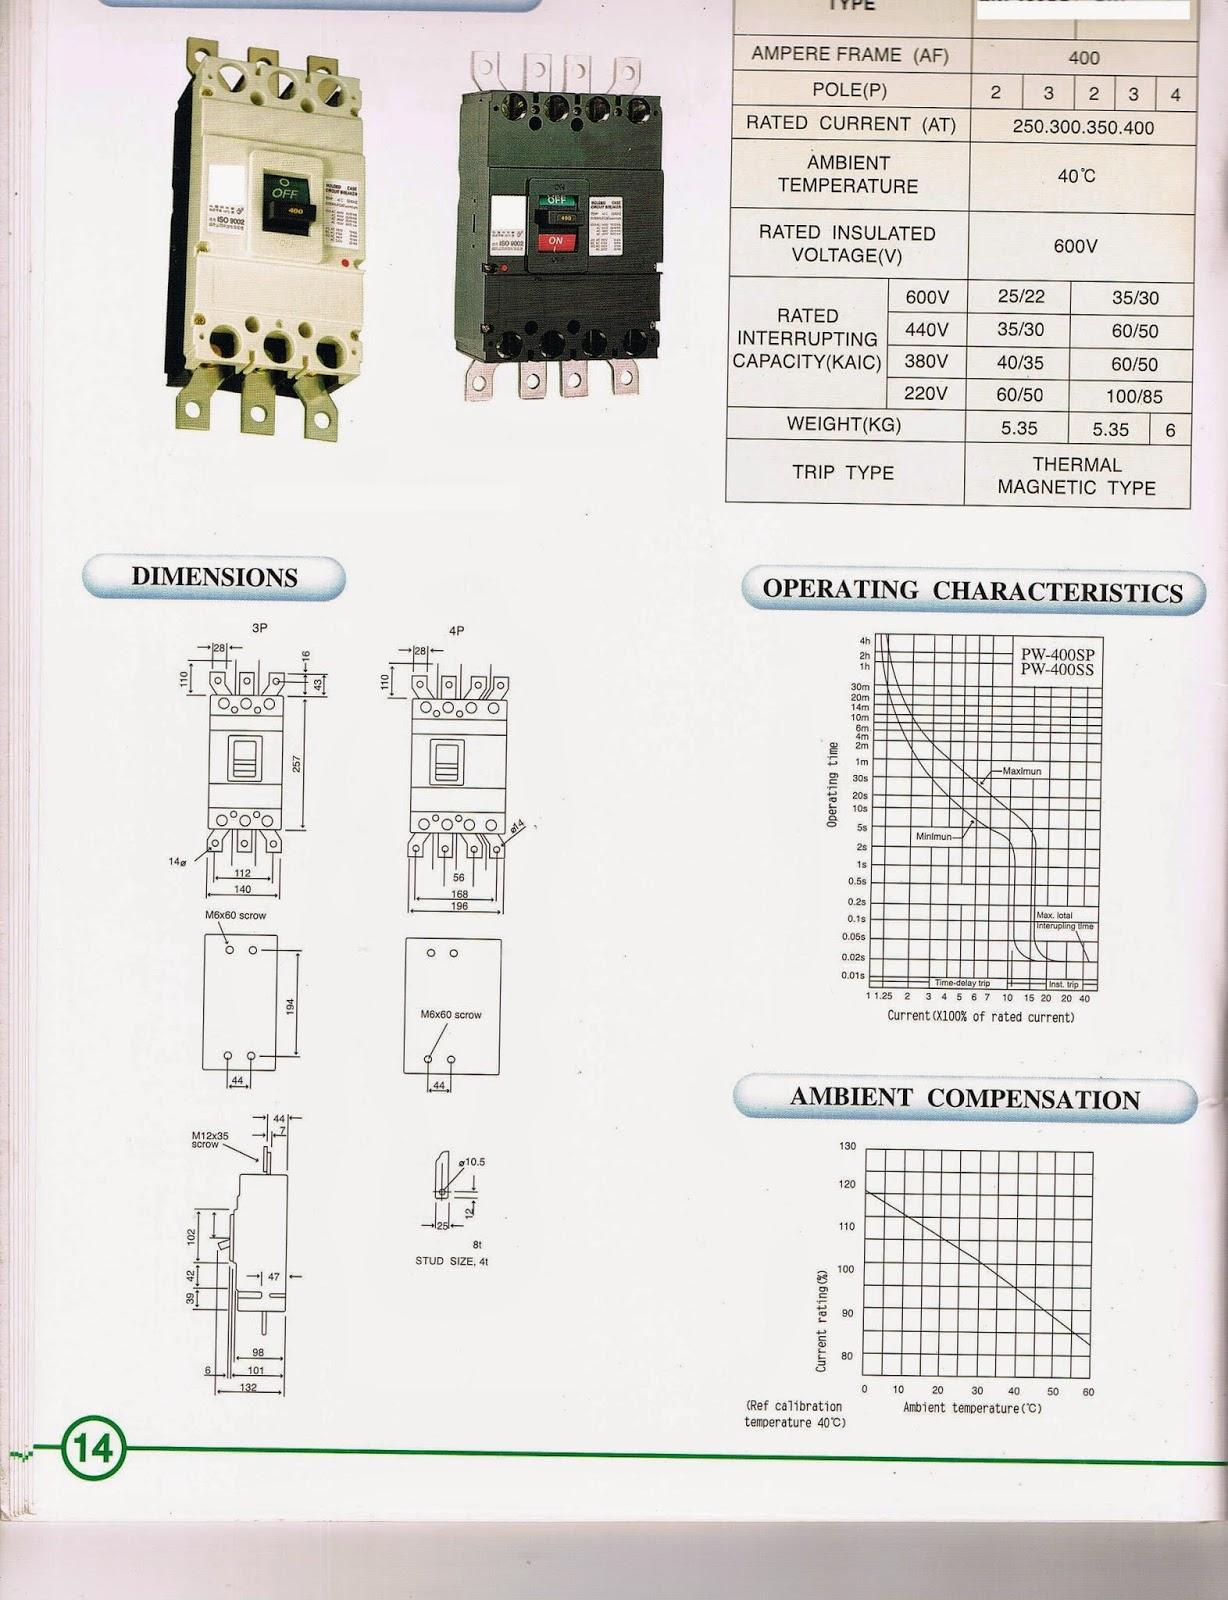 wiring devices supplier philippines wiring diagram for light switch u2022 rh lomond tw Cooper Wiring Devices Twist Lock Wiring Devices